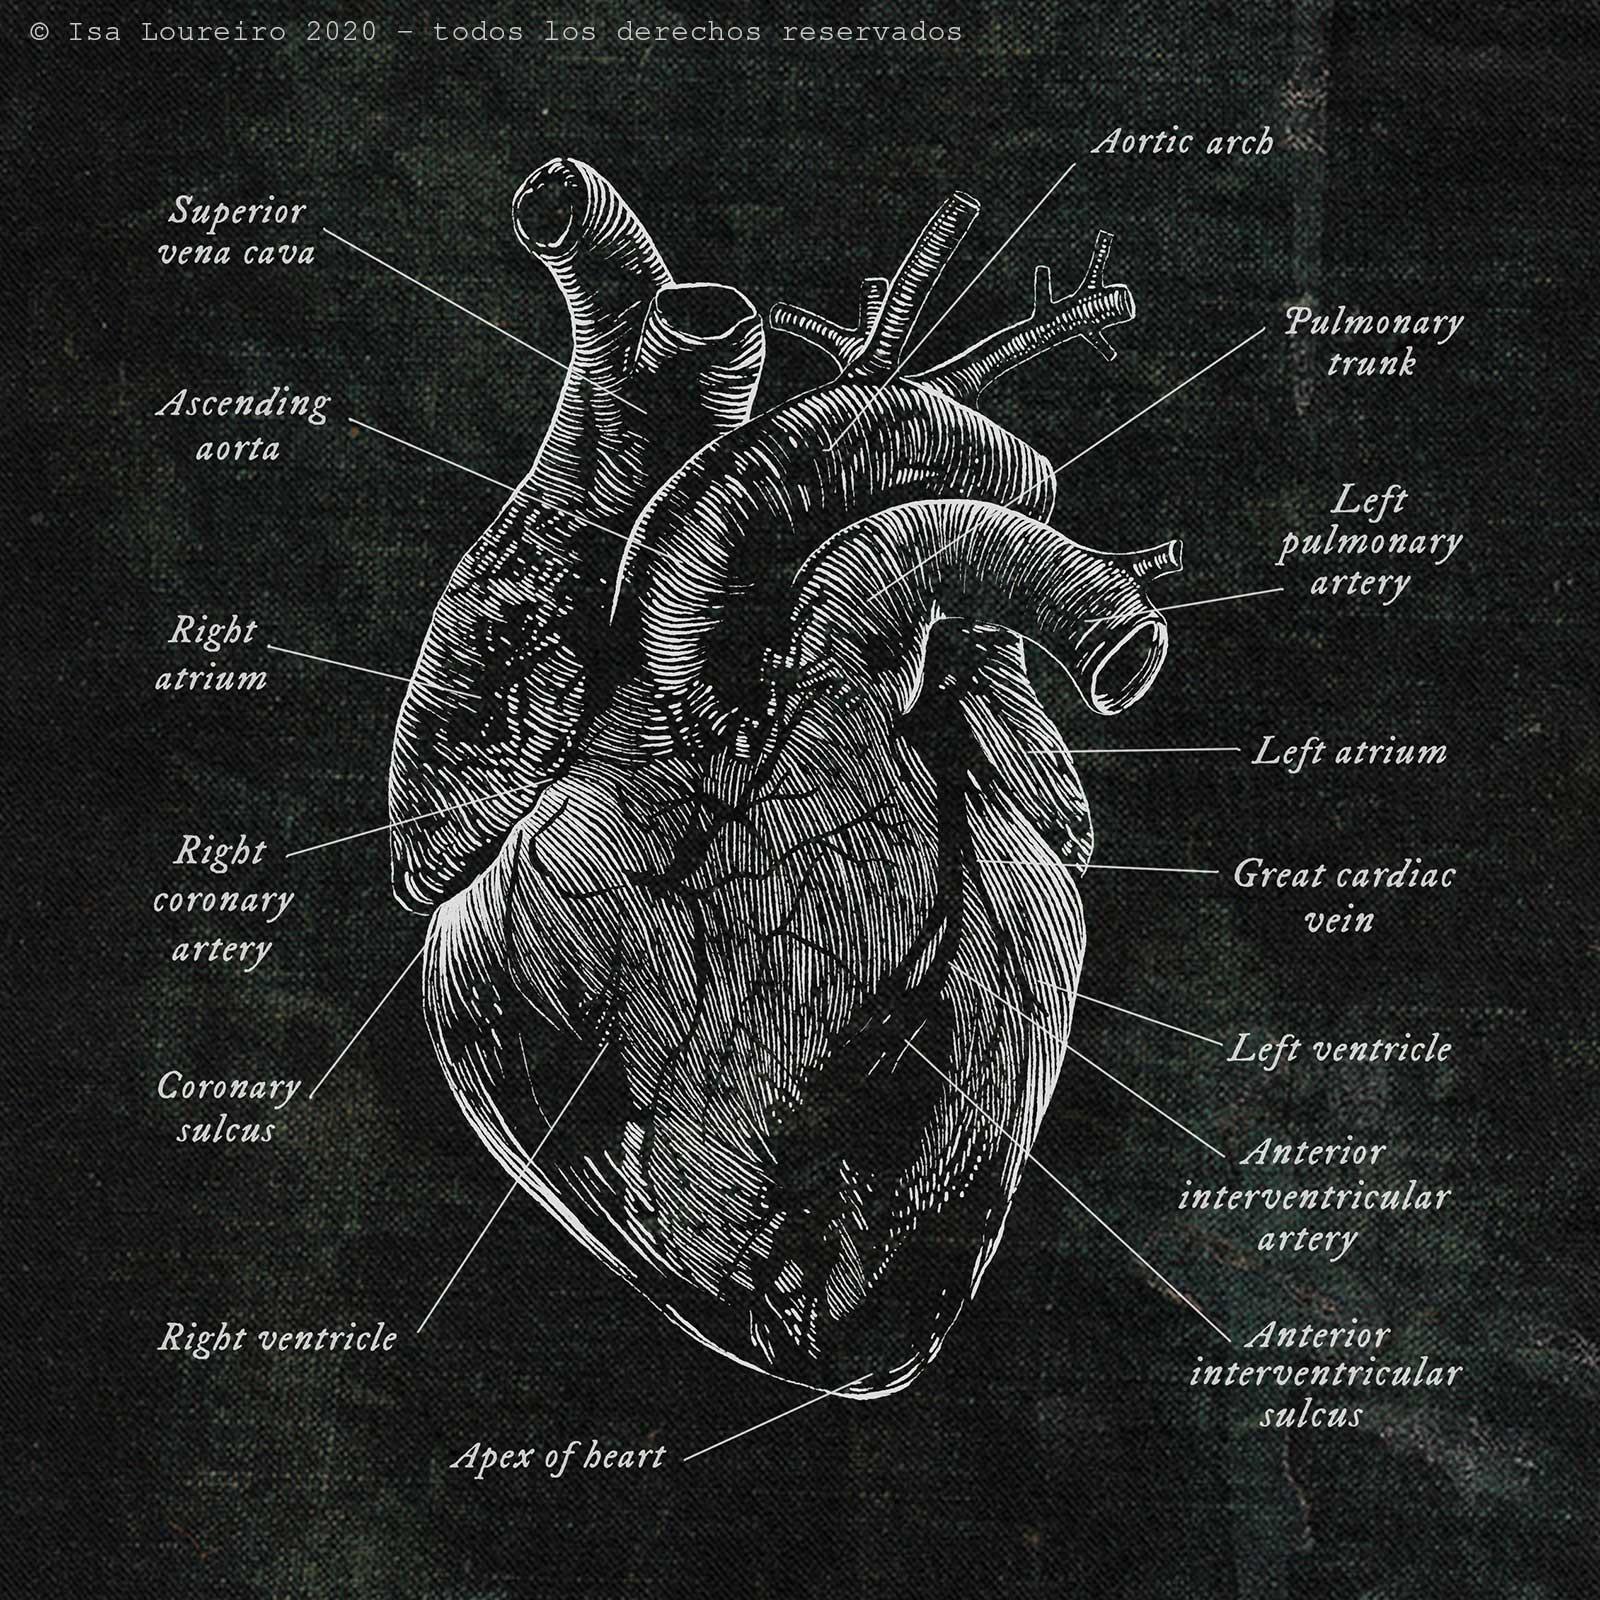 heart_white_engraving_isaloureiro